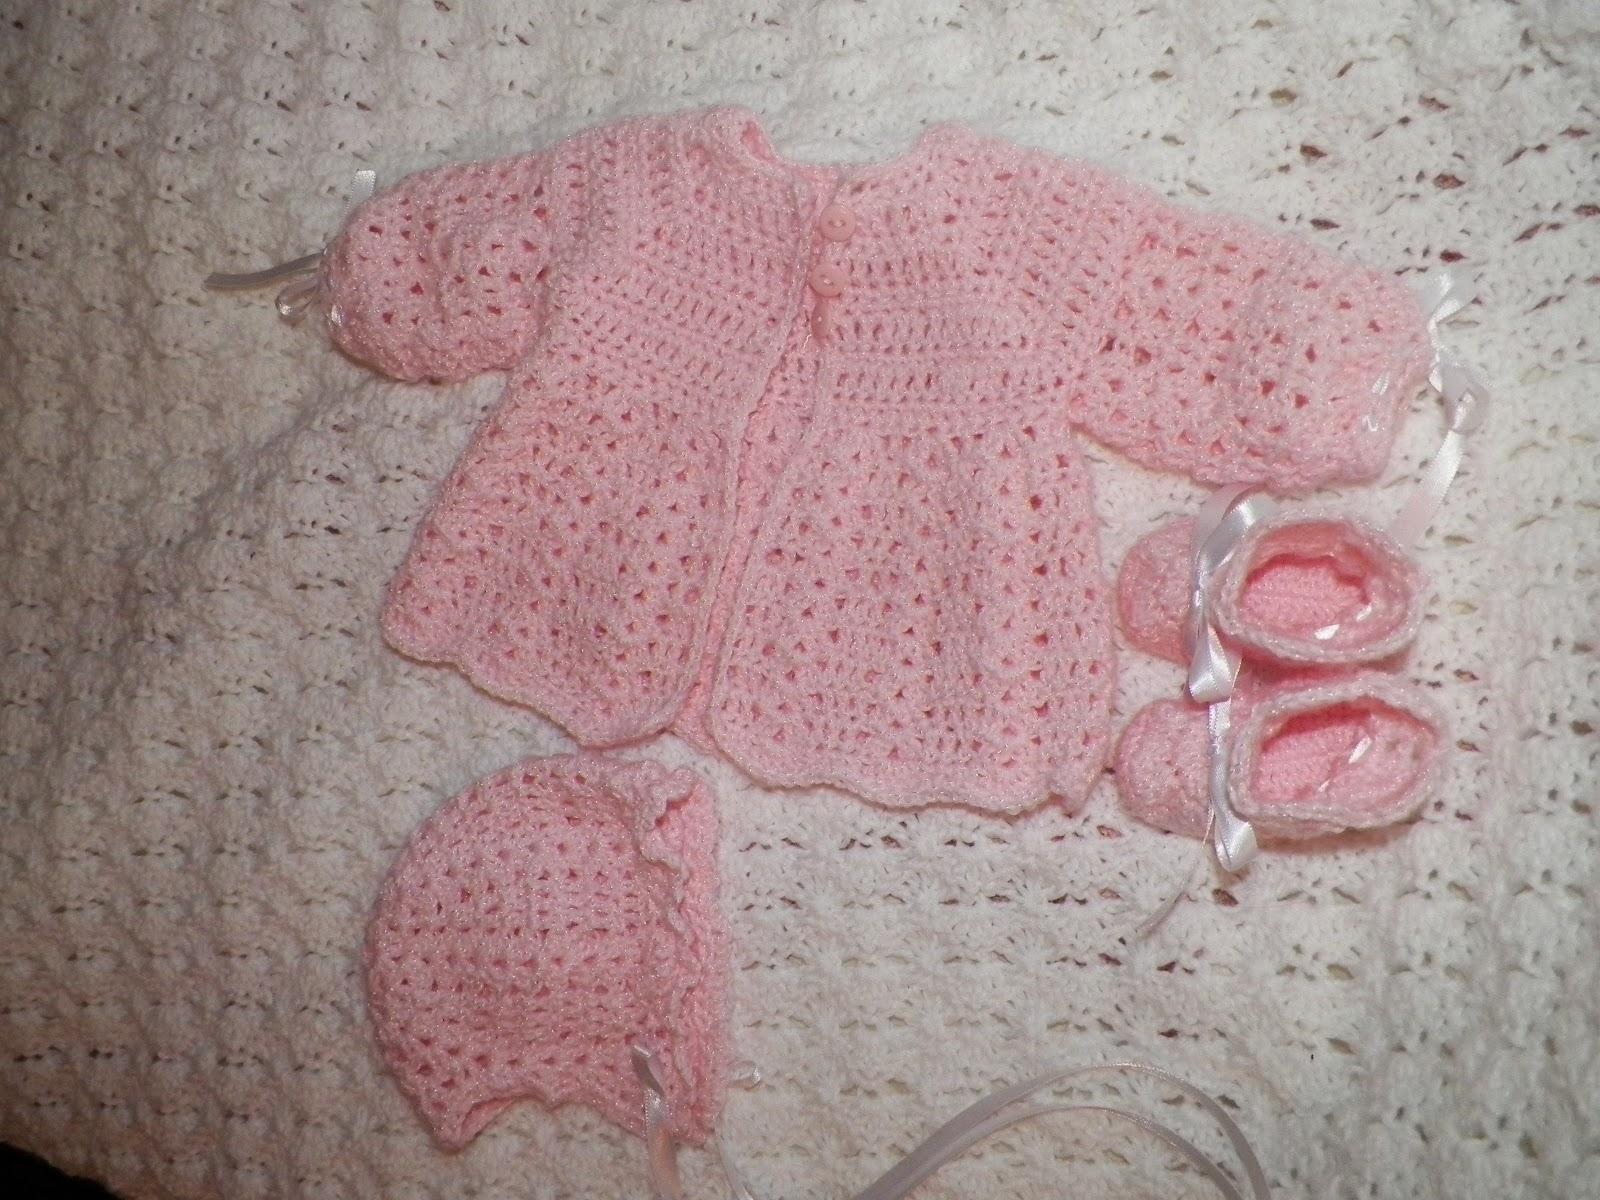 Crocheting Baby Stuff : ScrappingSuzieQTT: New crocheted BABY items!